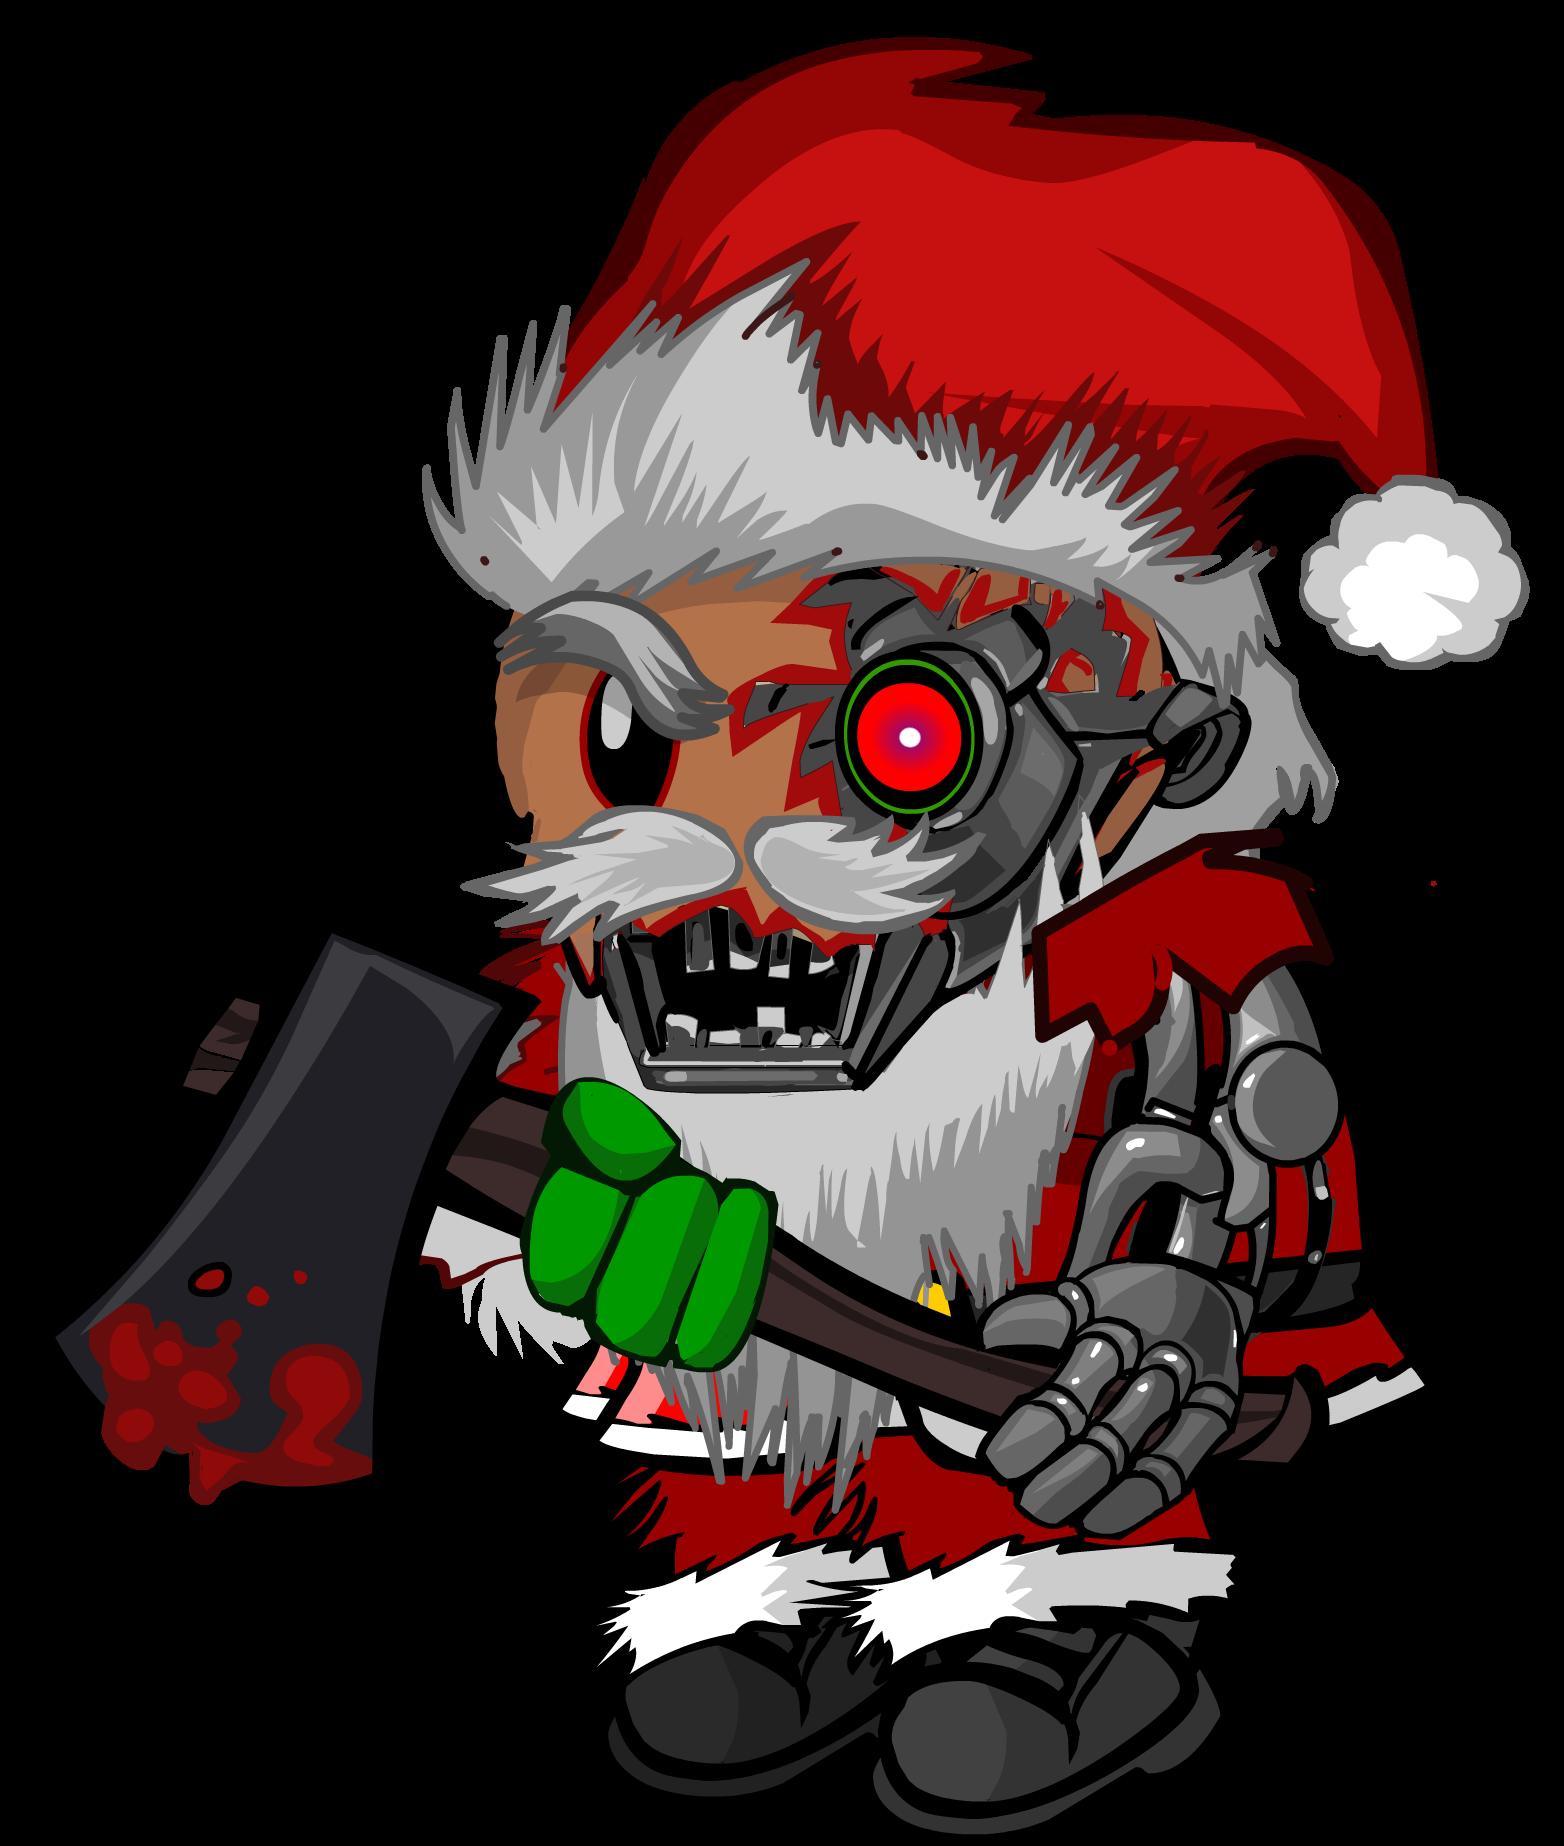 Dosya:Insane Santa.png